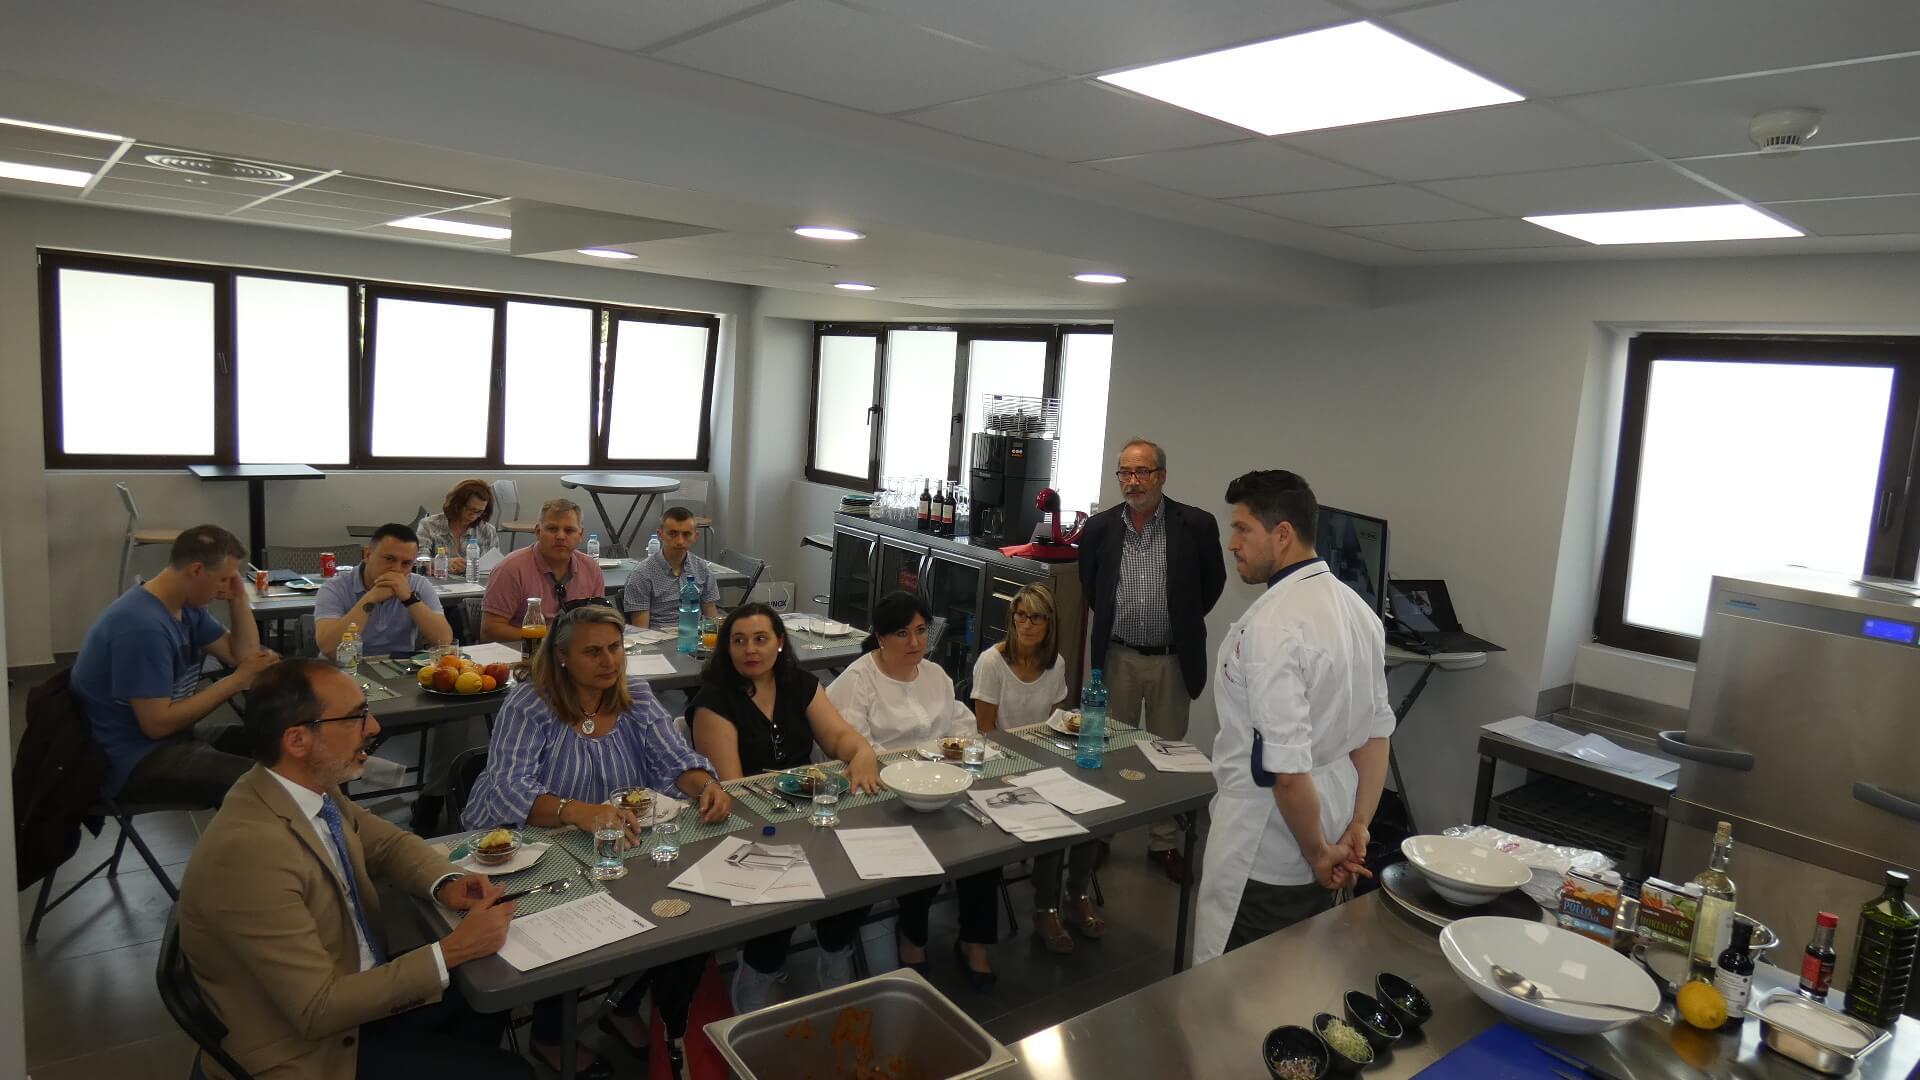 Escuela de cocina en Alcobendas